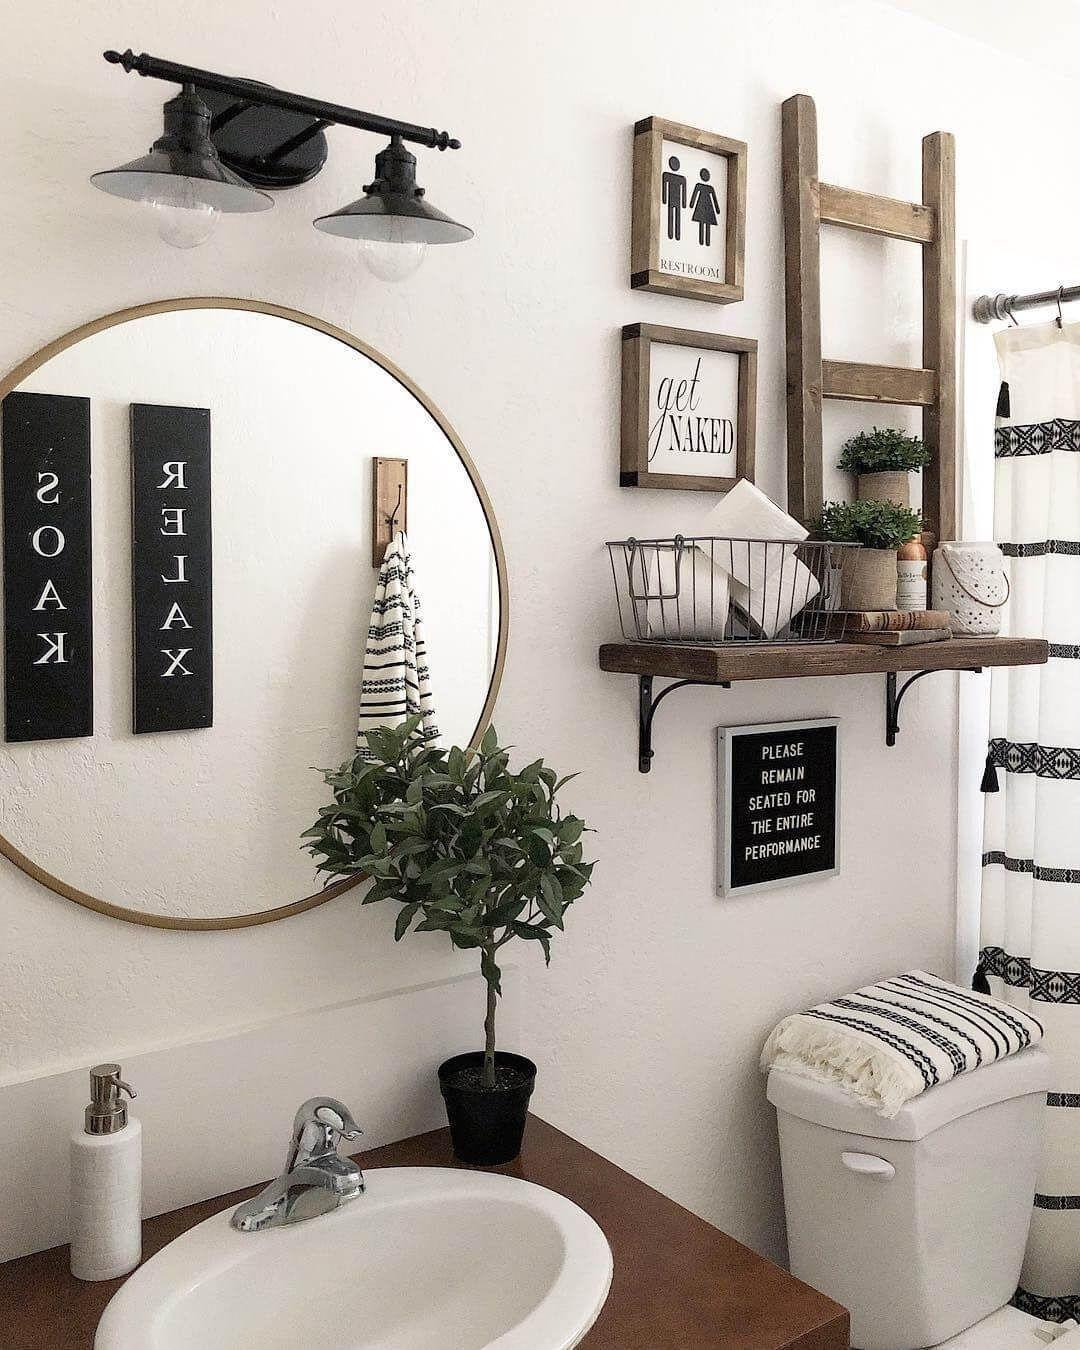 25 Stunning Shabby Chic Bathroom Designs That Will Adore You - 999D1302C352C4A0F872050Daf787C6F